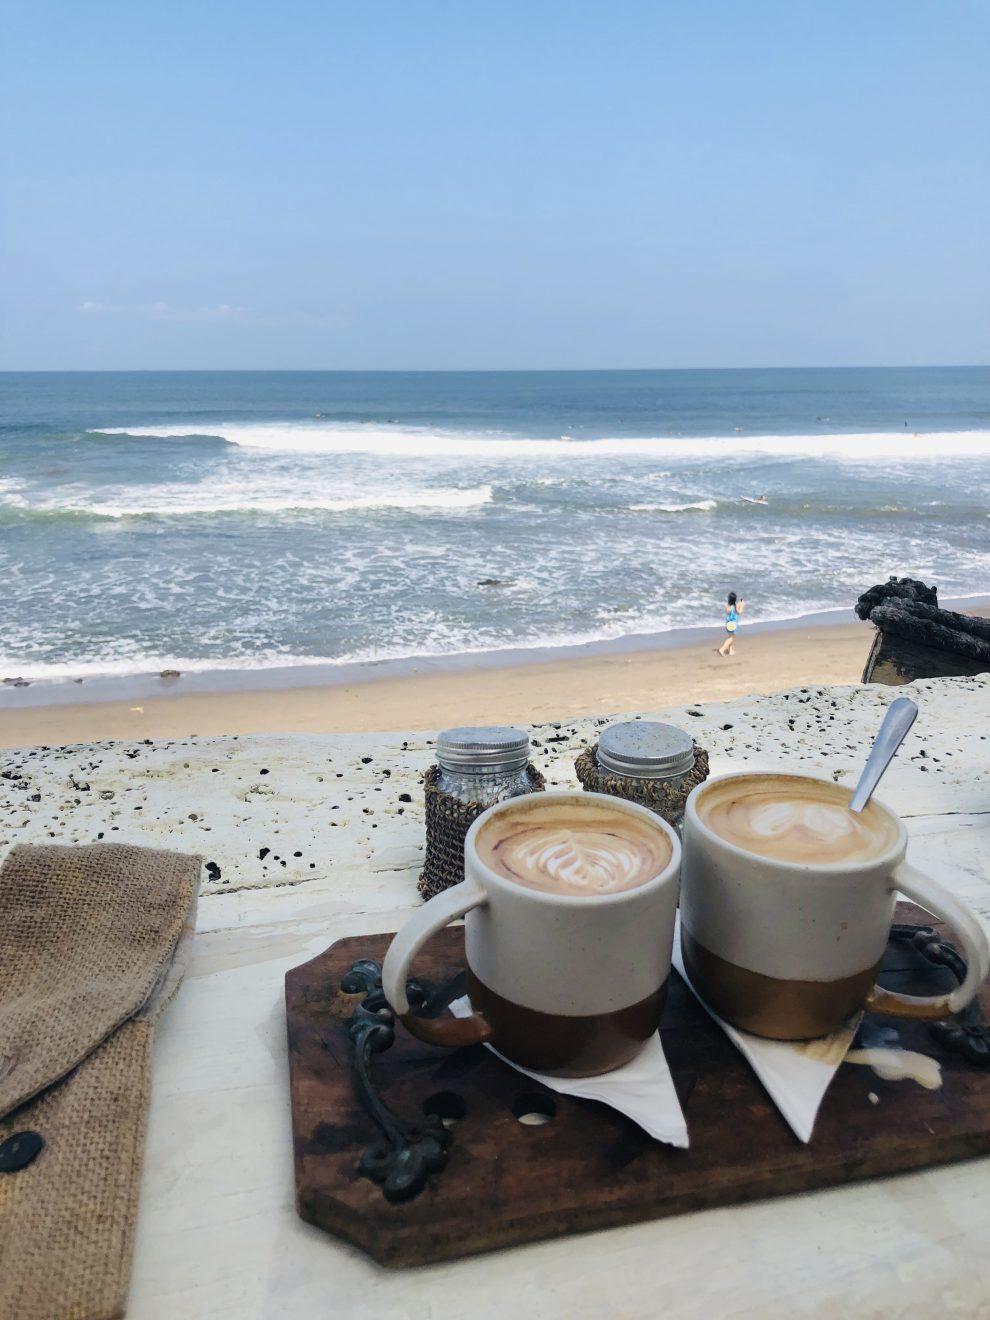 Eerste keer op vakantie naar Bali. 21-daagse reisroute & 10 tips - Dingen doen op Bali - beachclubs La Brisa